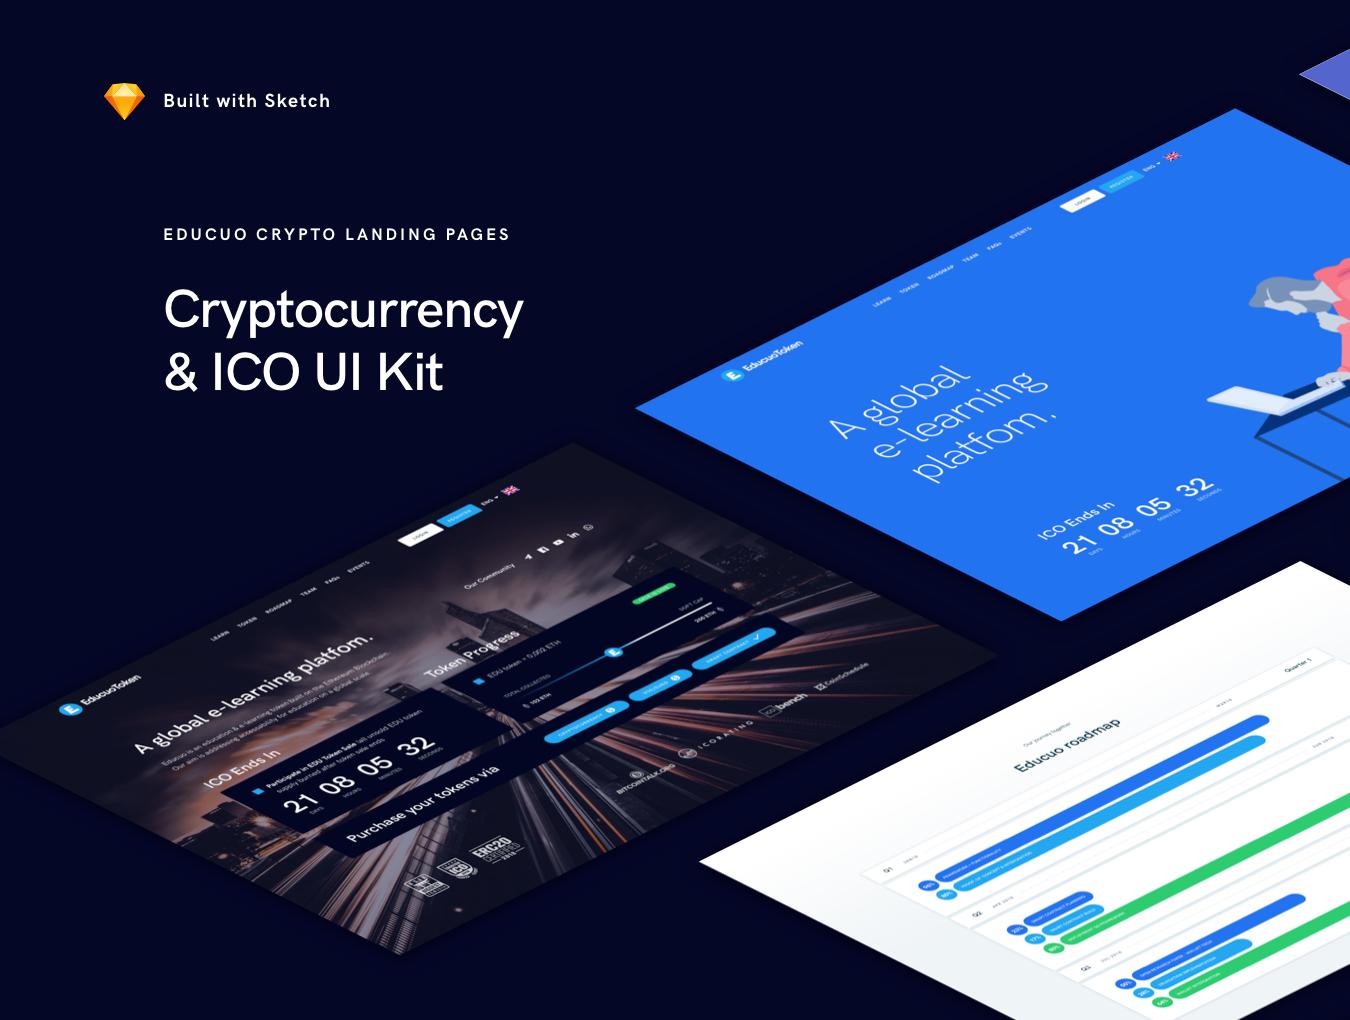 WEB端教育官方网站网页设计Educuo ICO UI Kit